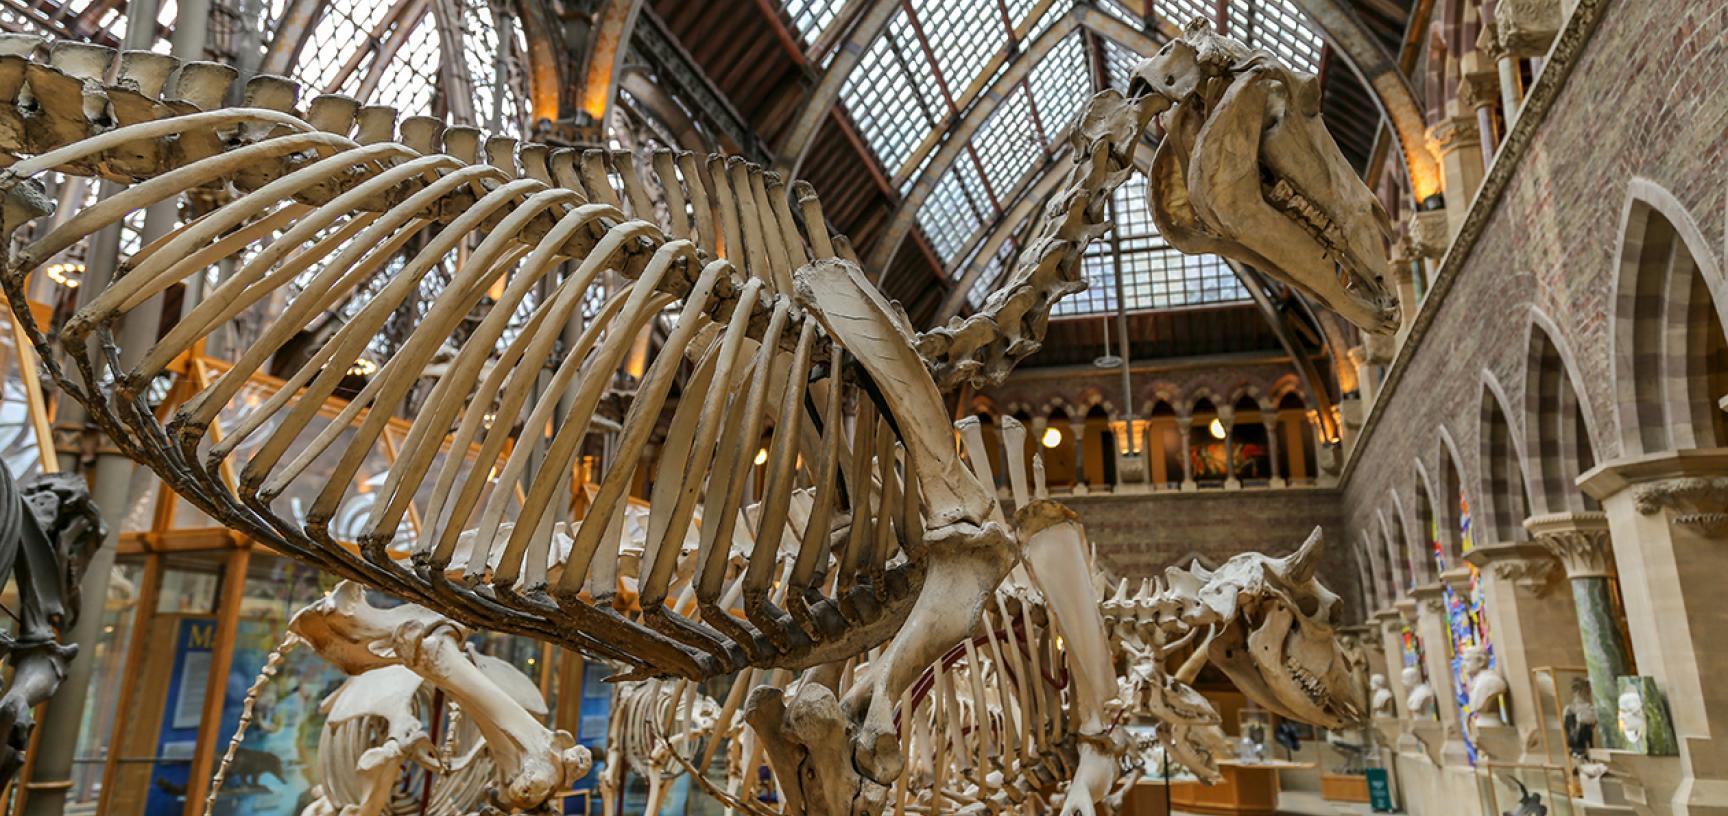 Horse skeleton (Equus caballus) with bison in background.